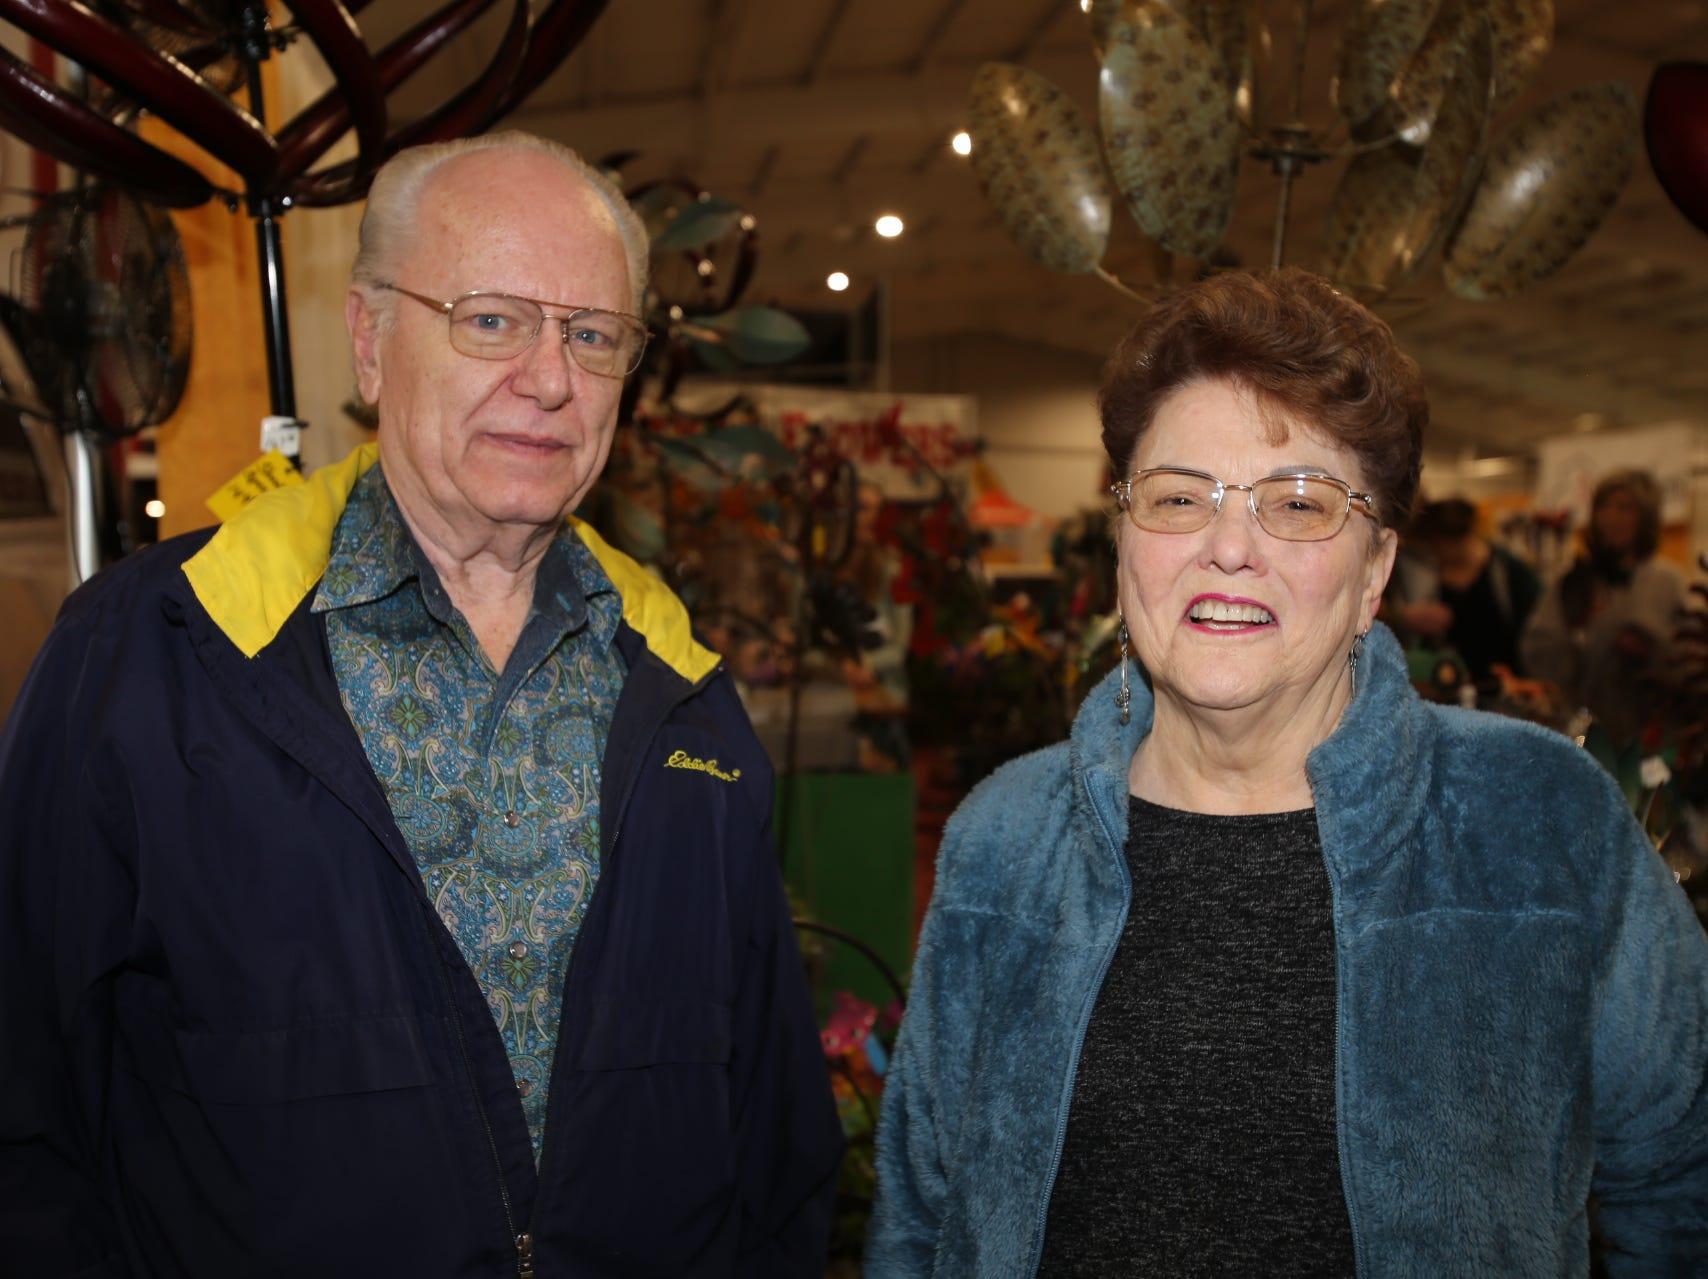 Donald and Rita Green